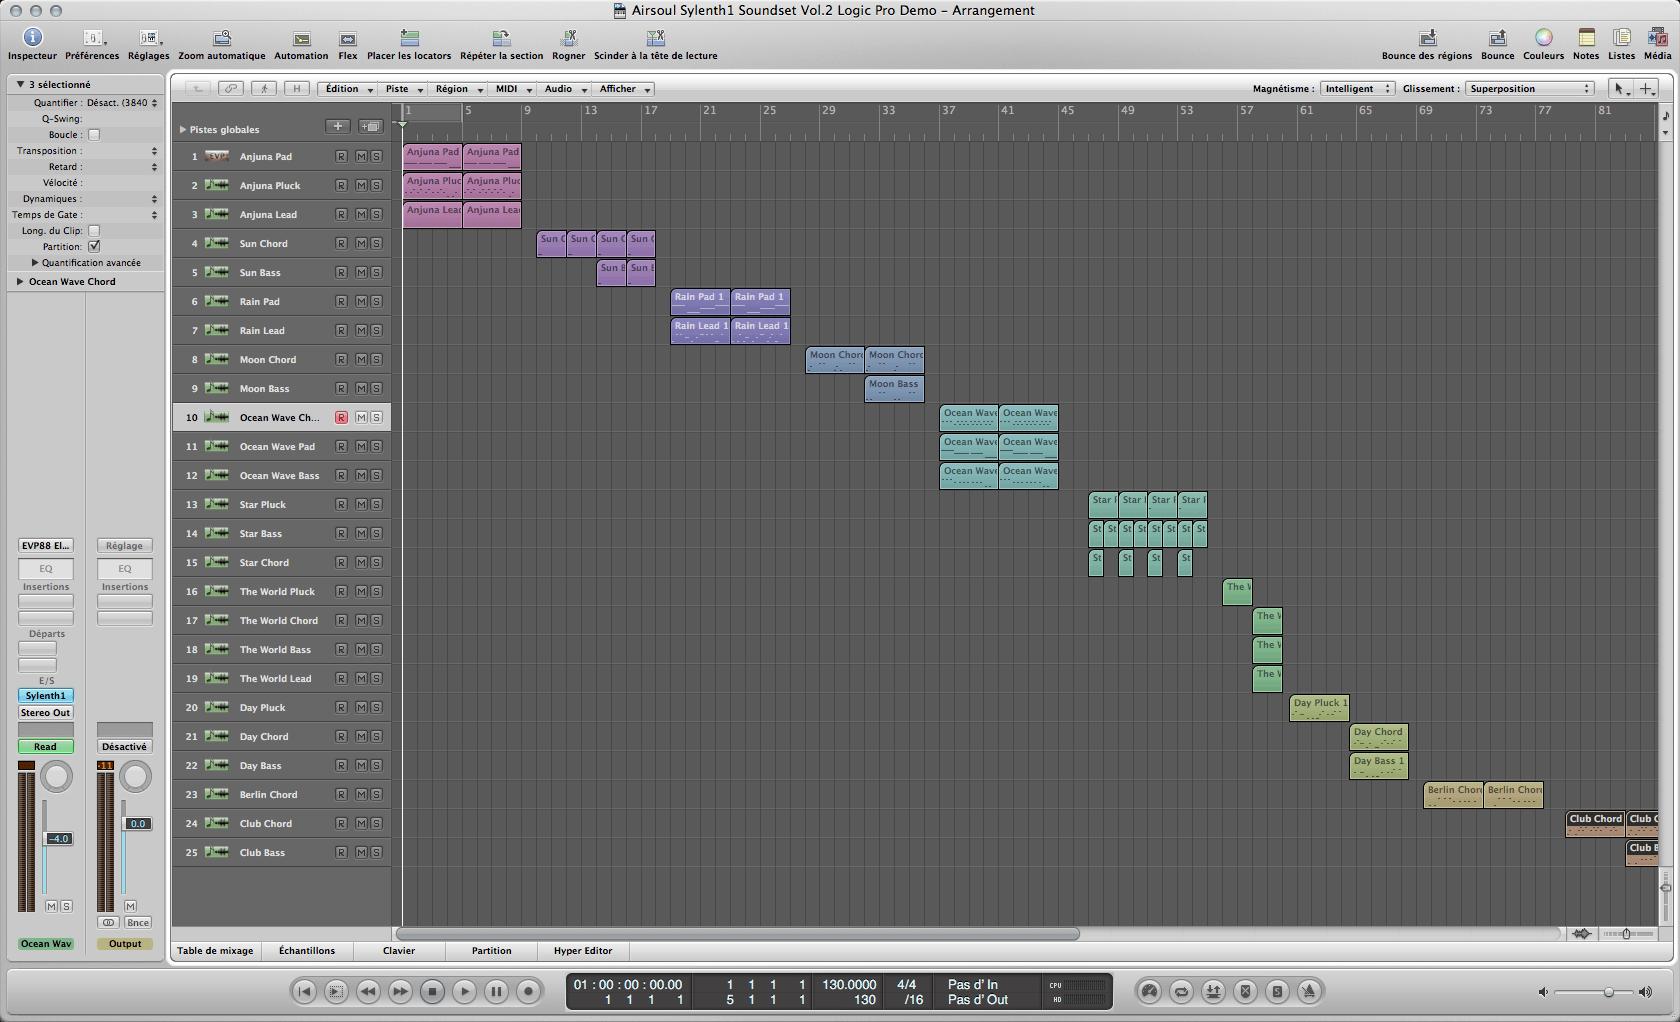 airsoul-vol-2-sylenth1-soundset-logic-demo